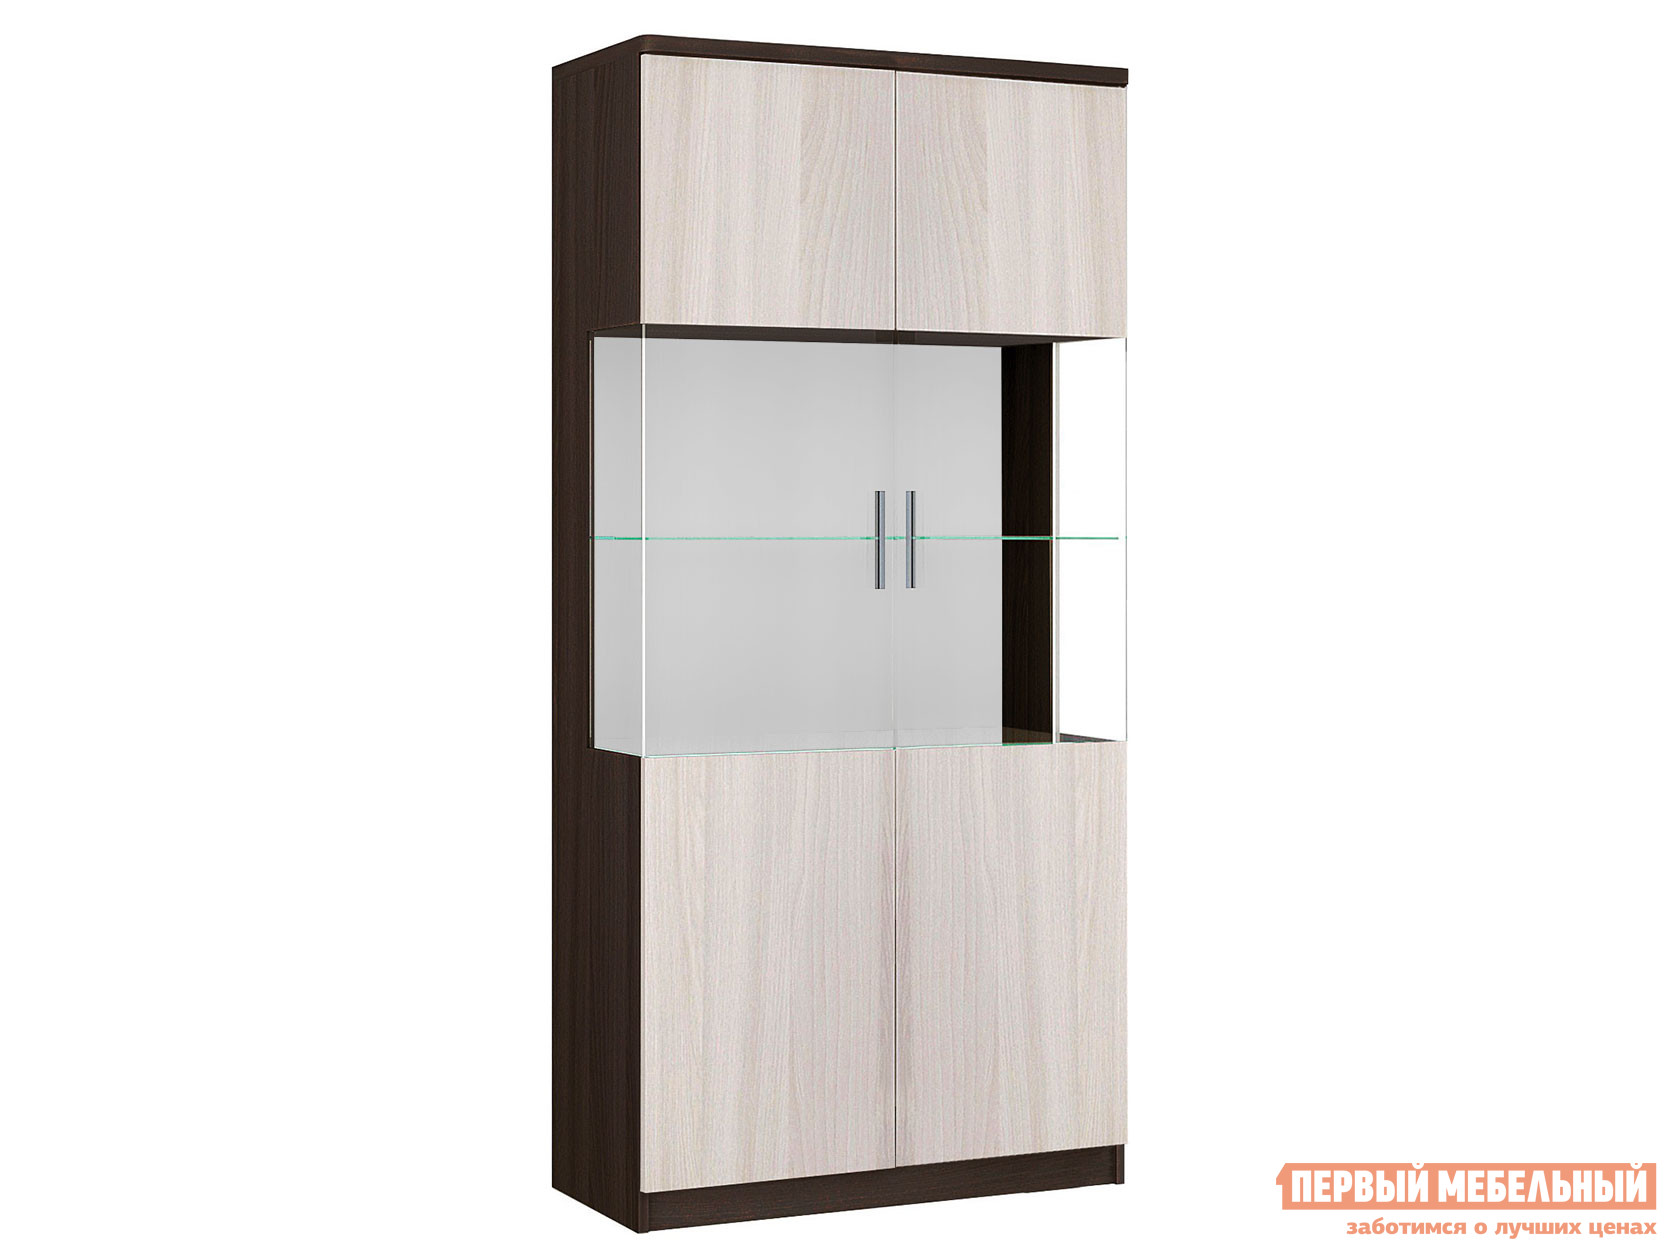 Шкаф-витрина Боровичи Модерн 17.07 цена